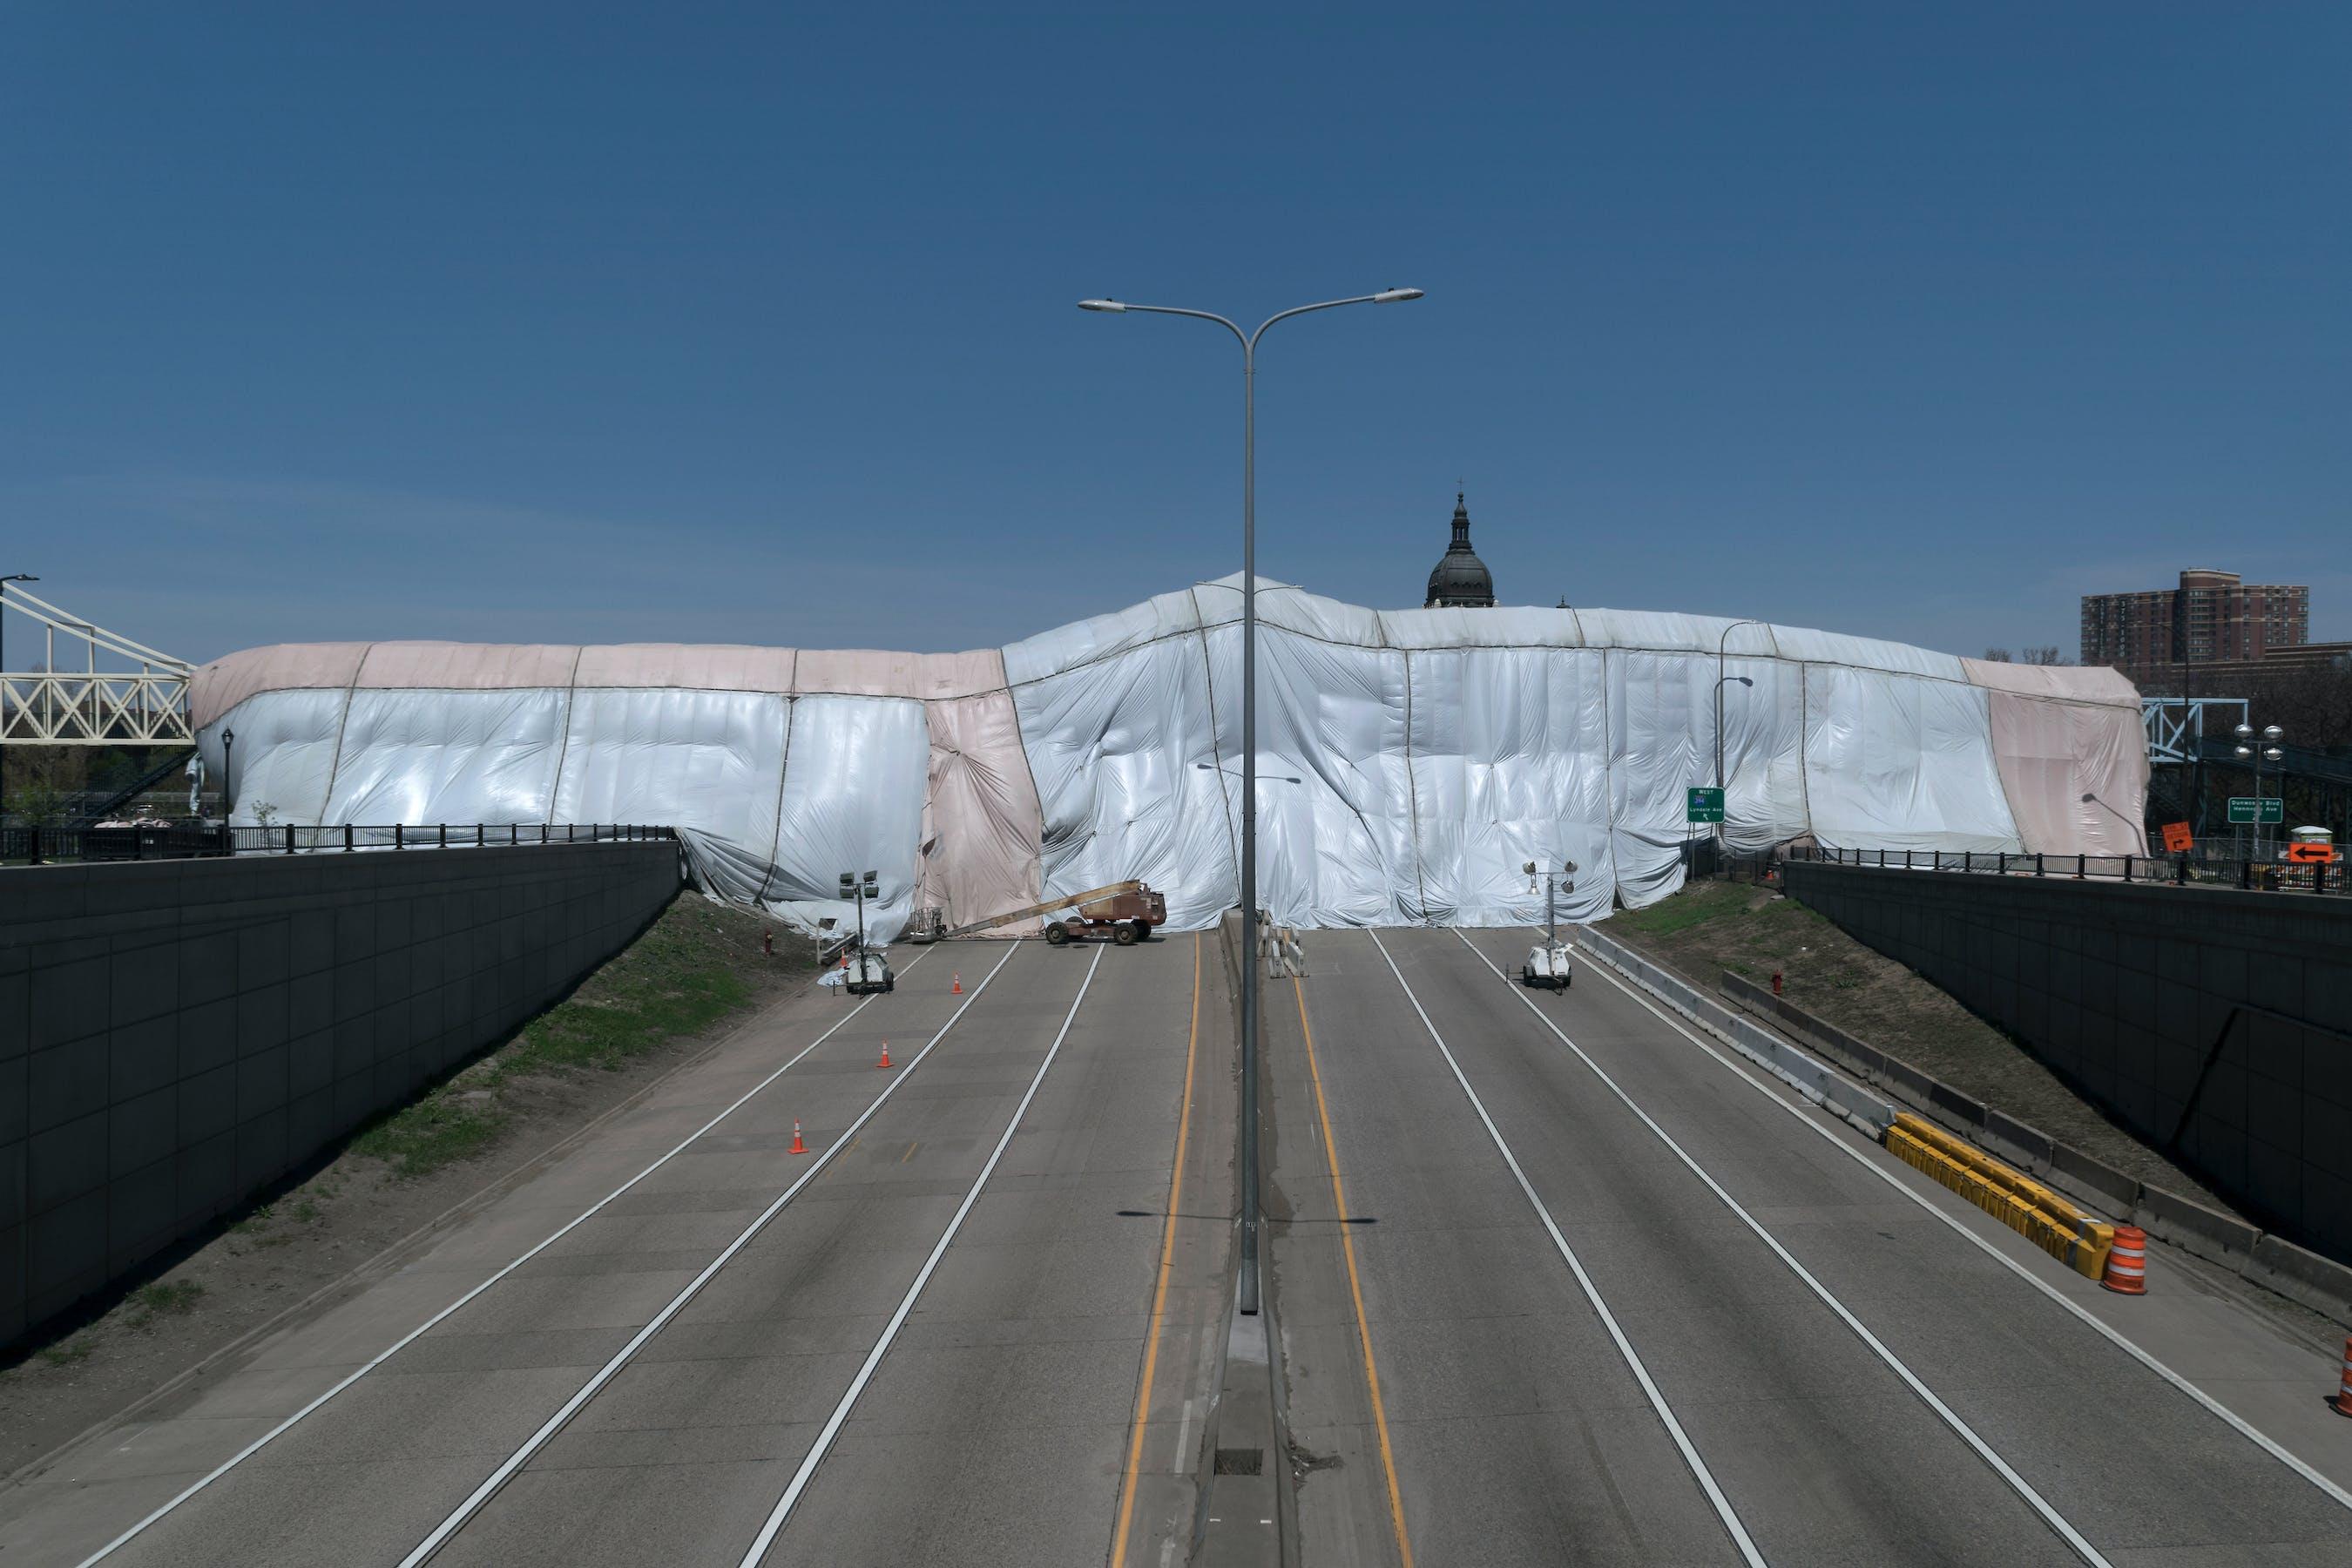 eee289124d Under Wraps: What's Happening with the Walker's Siah Armajani Bridge?